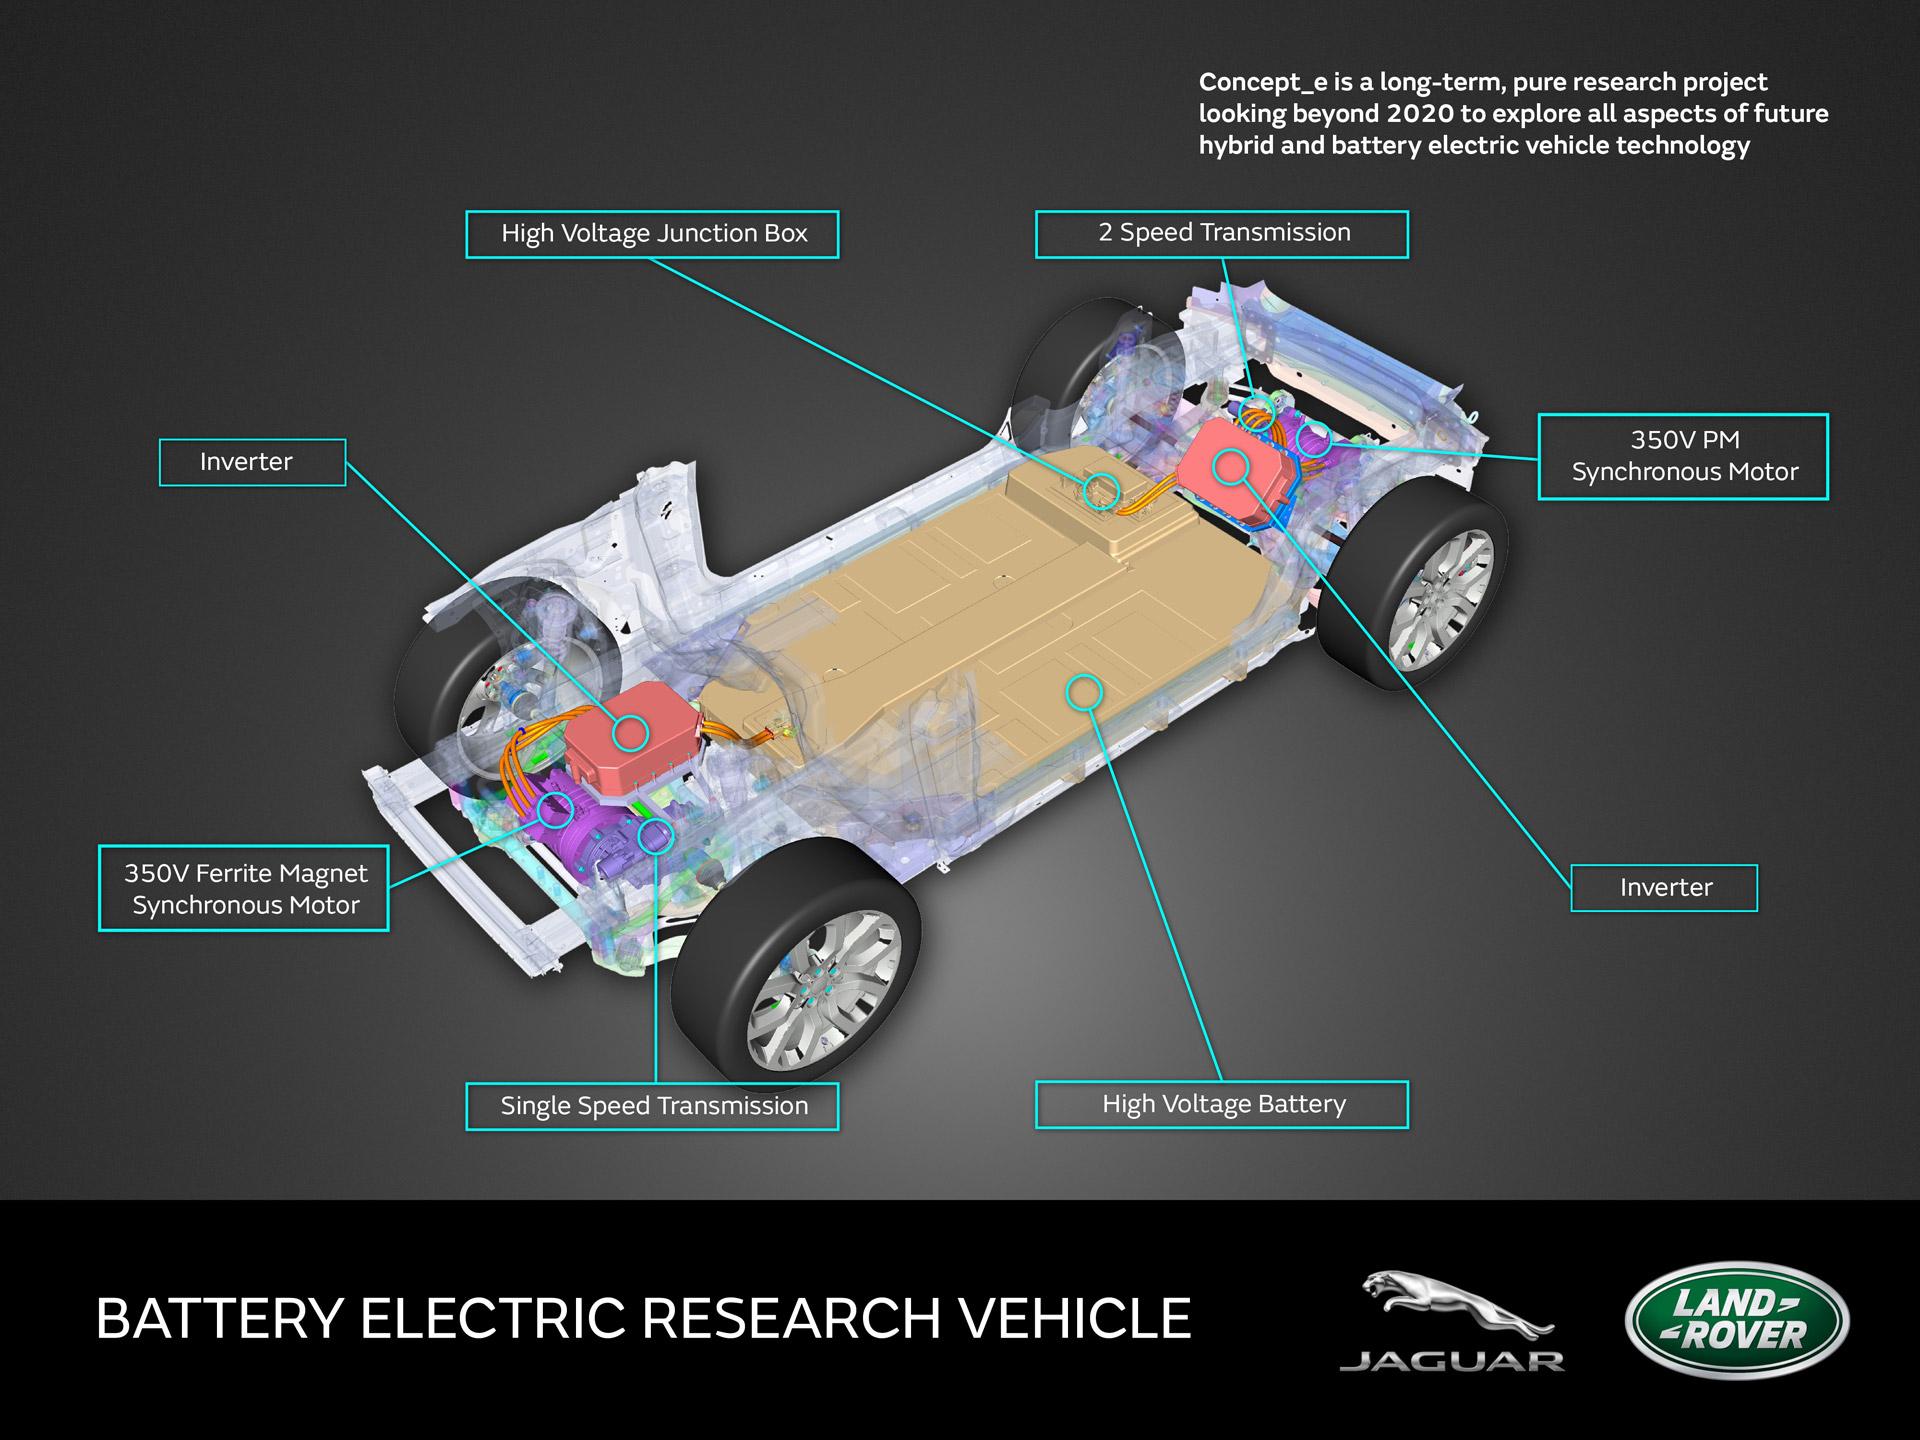 Jaguar Land Rover s Future Electric Car Efficiency Concepts Previewed